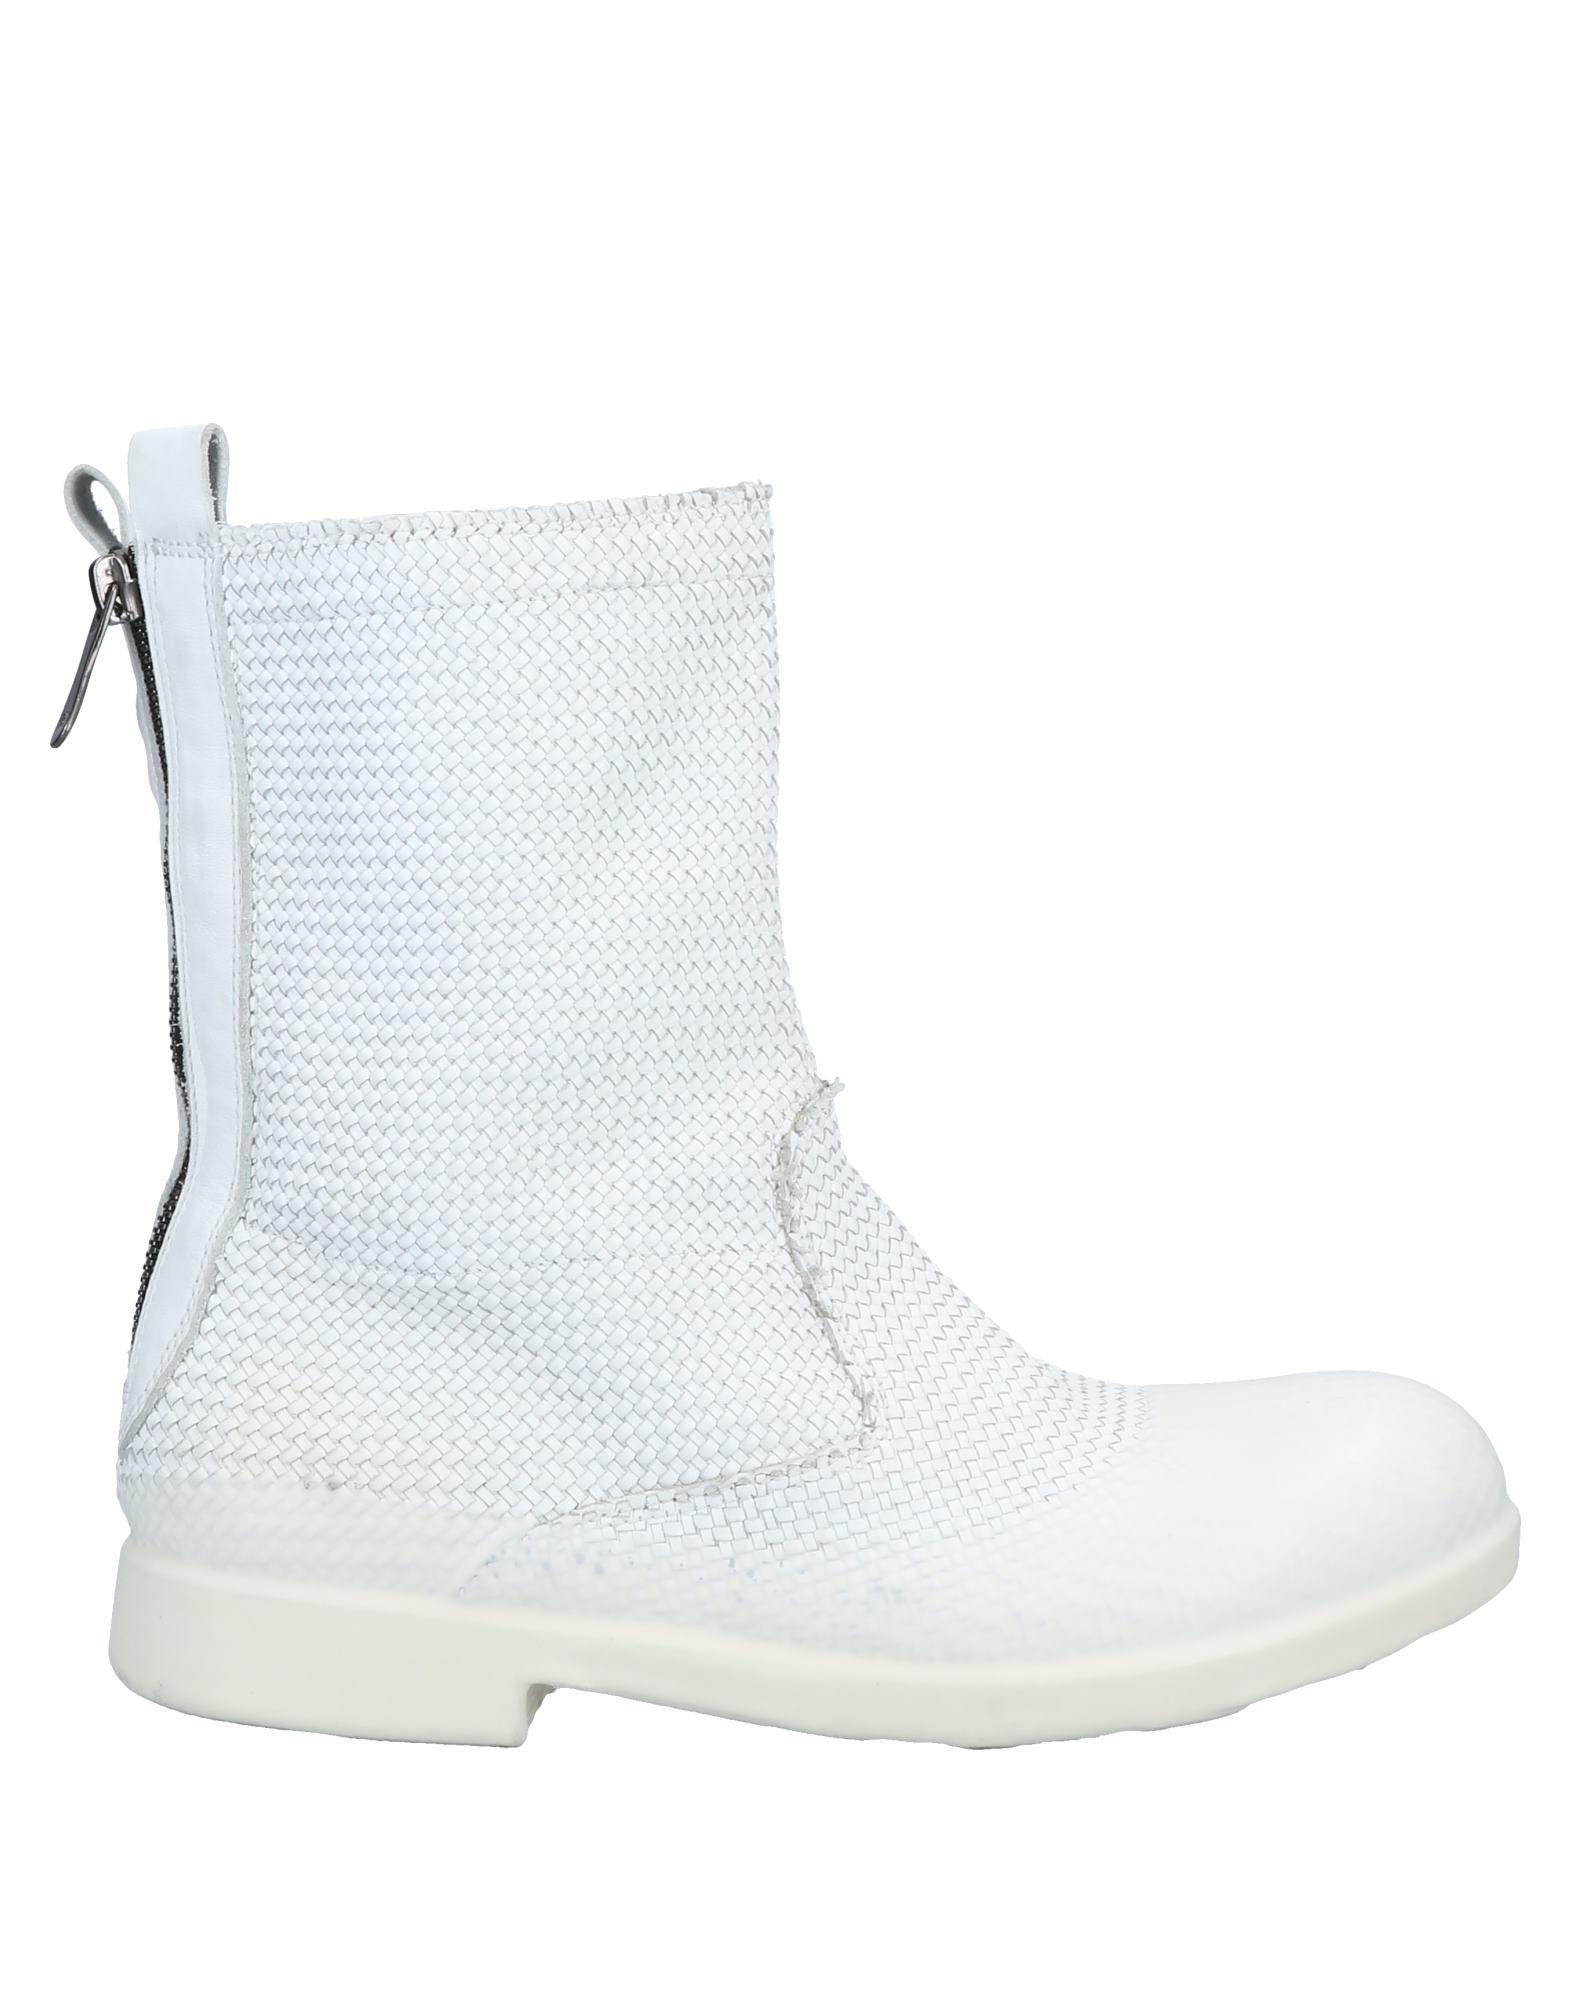 O.X.S. RUBBER SOUL Полусапоги и высокие ботинки